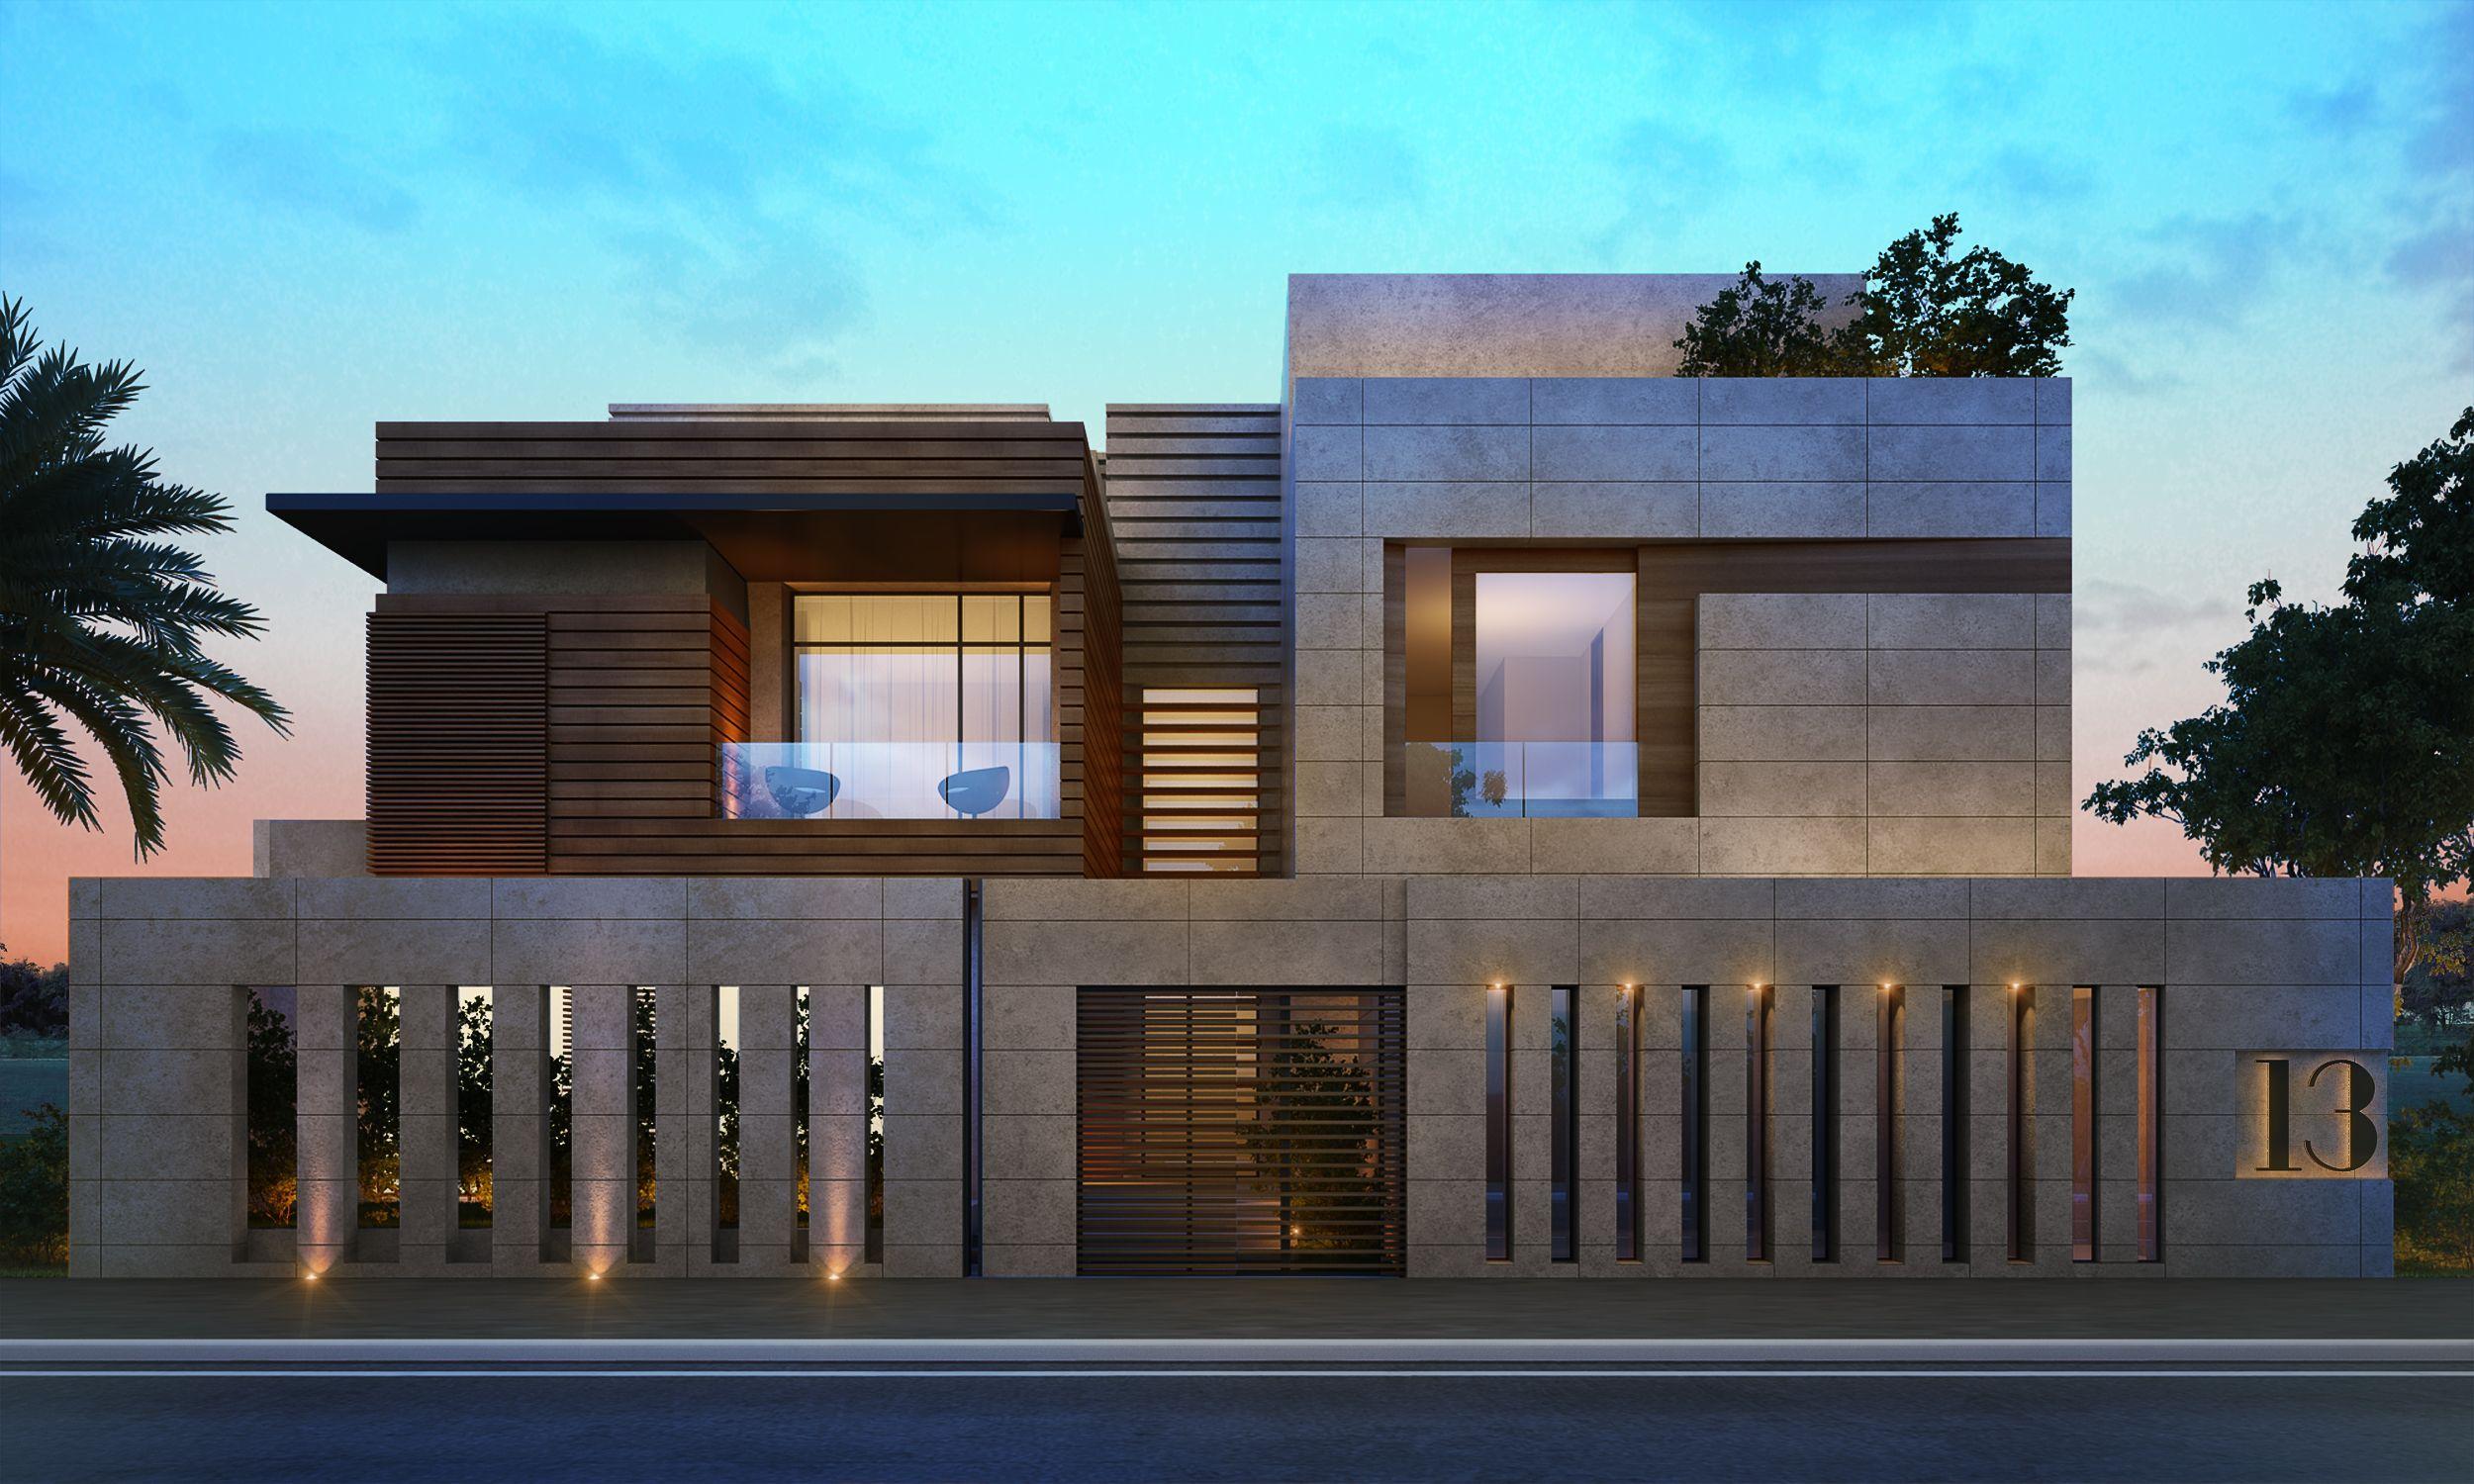 Hausfrontdesign in rajasthan  m private villa aldahya kuwait sarah sadeq architects  outdoor